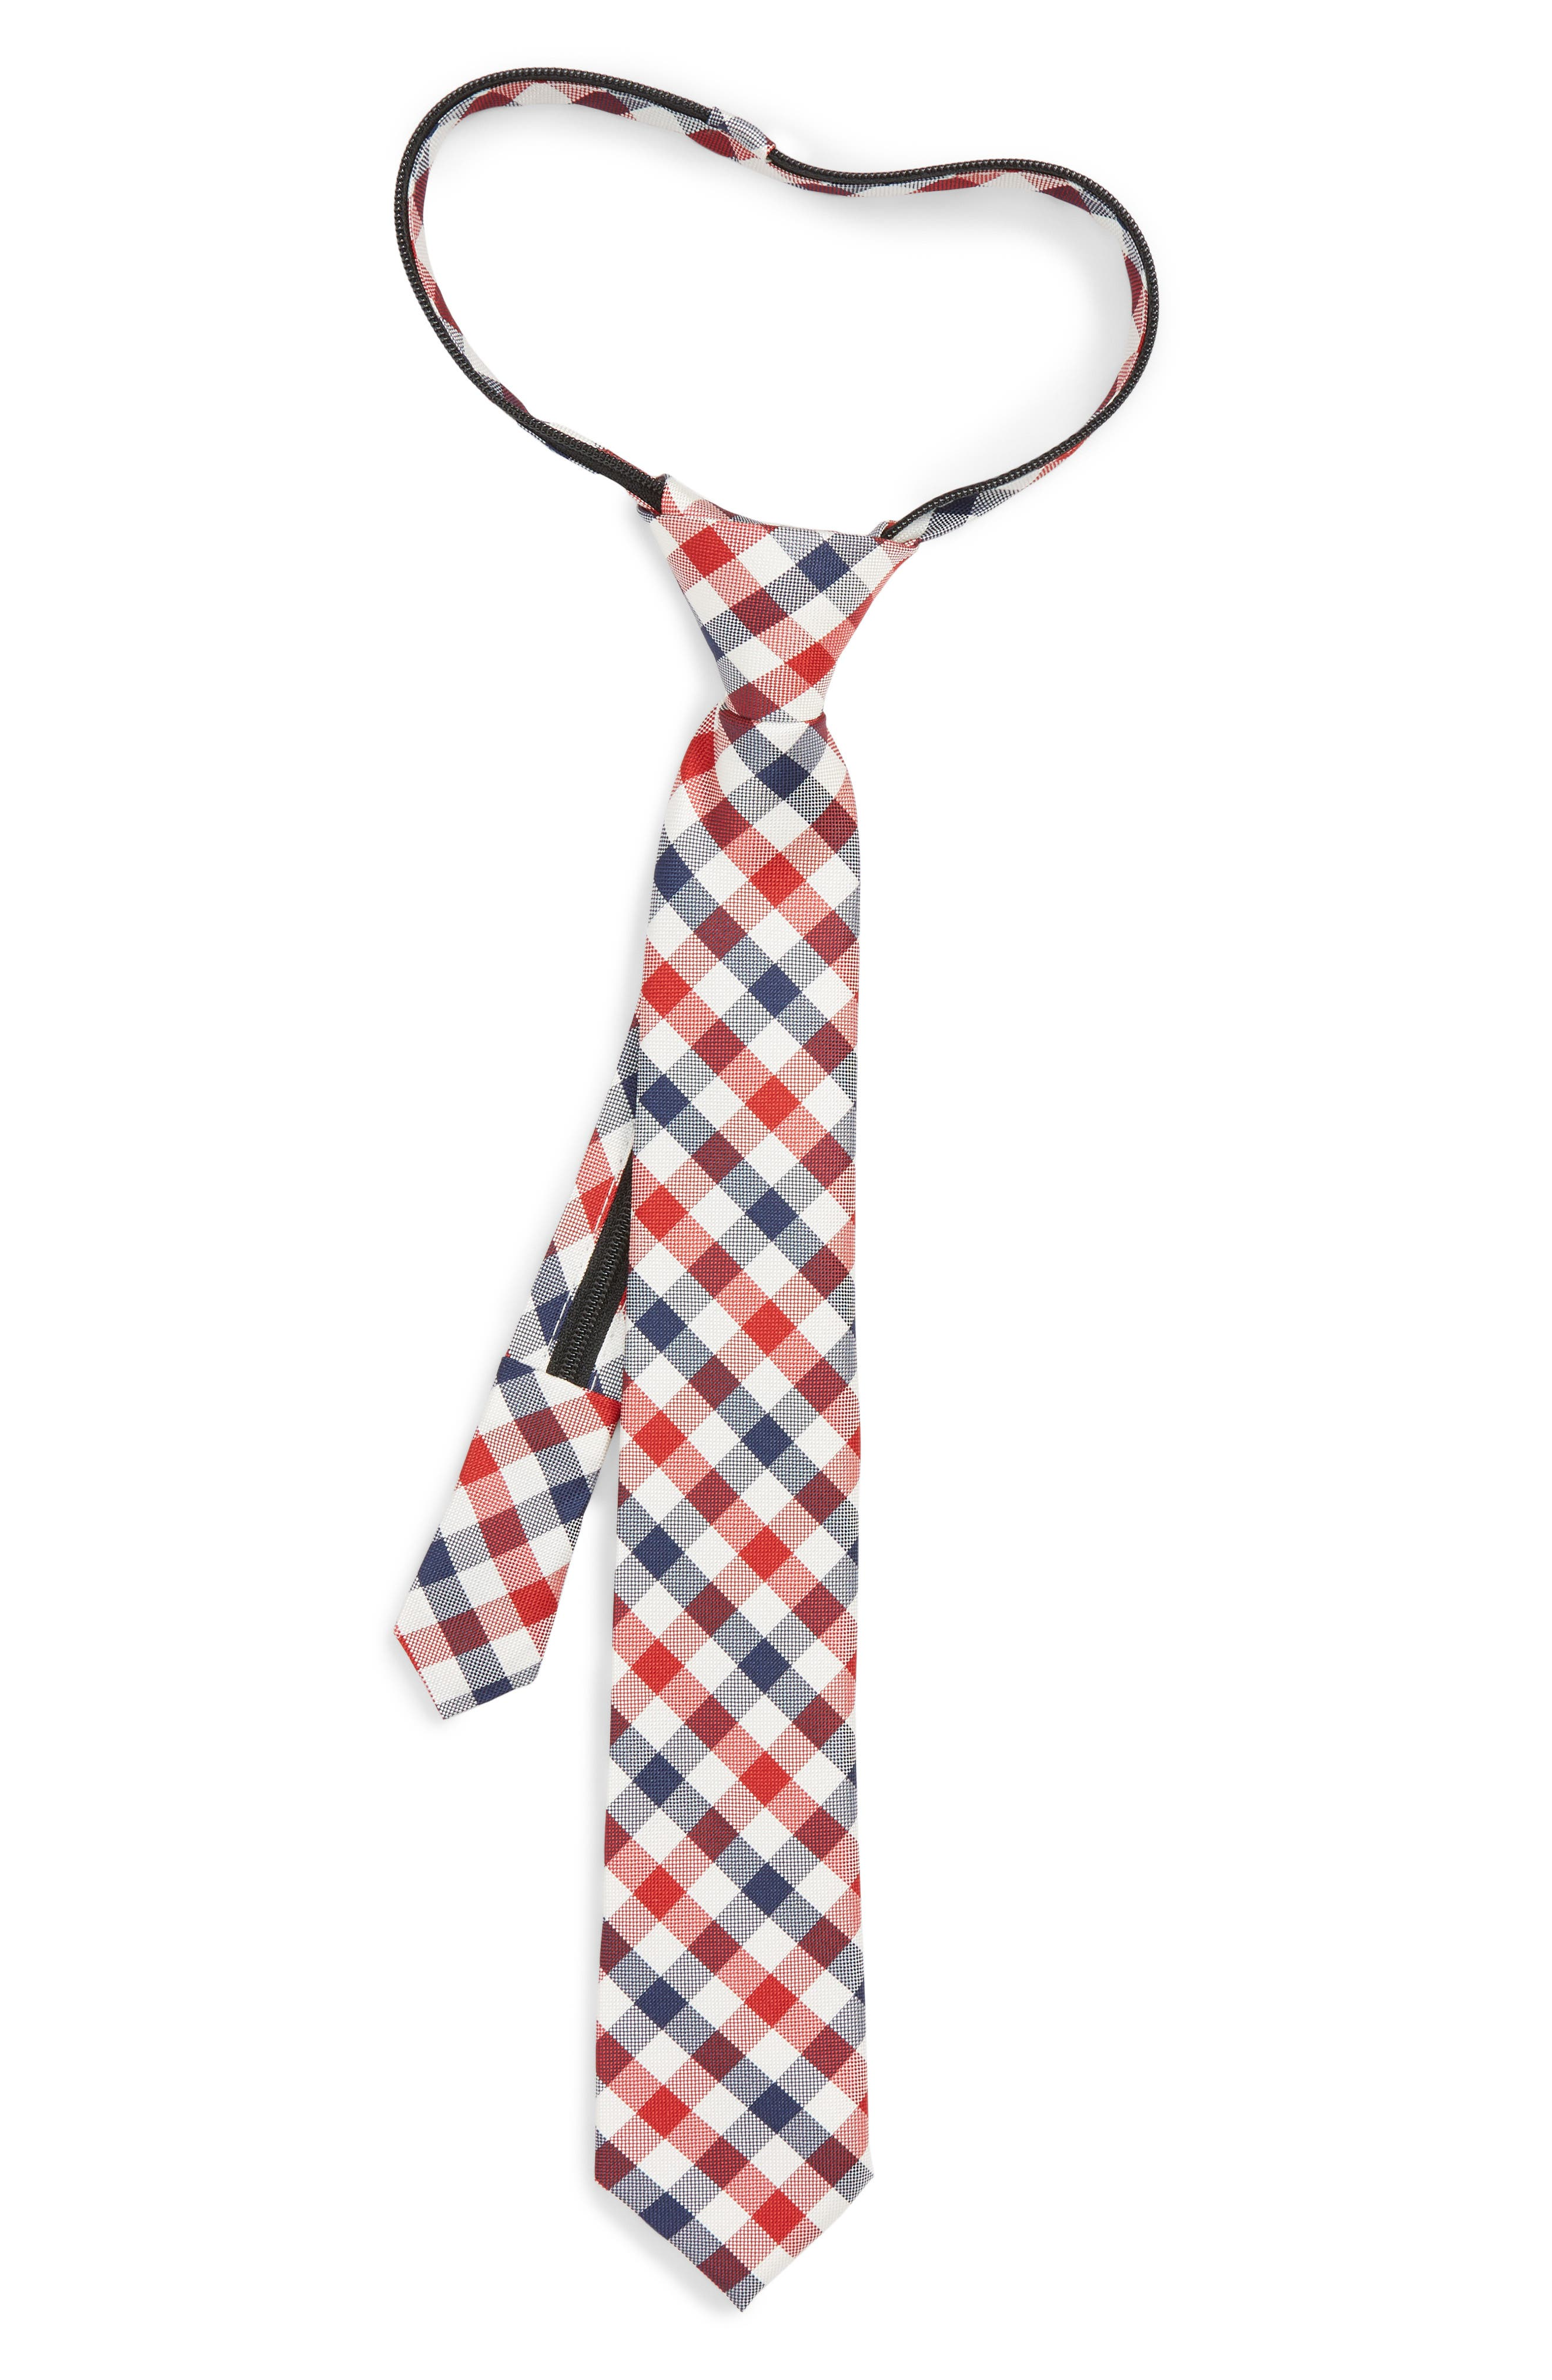 Natte Weave Silk Zip Tie,                             Main thumbnail 1, color,                             NAVY